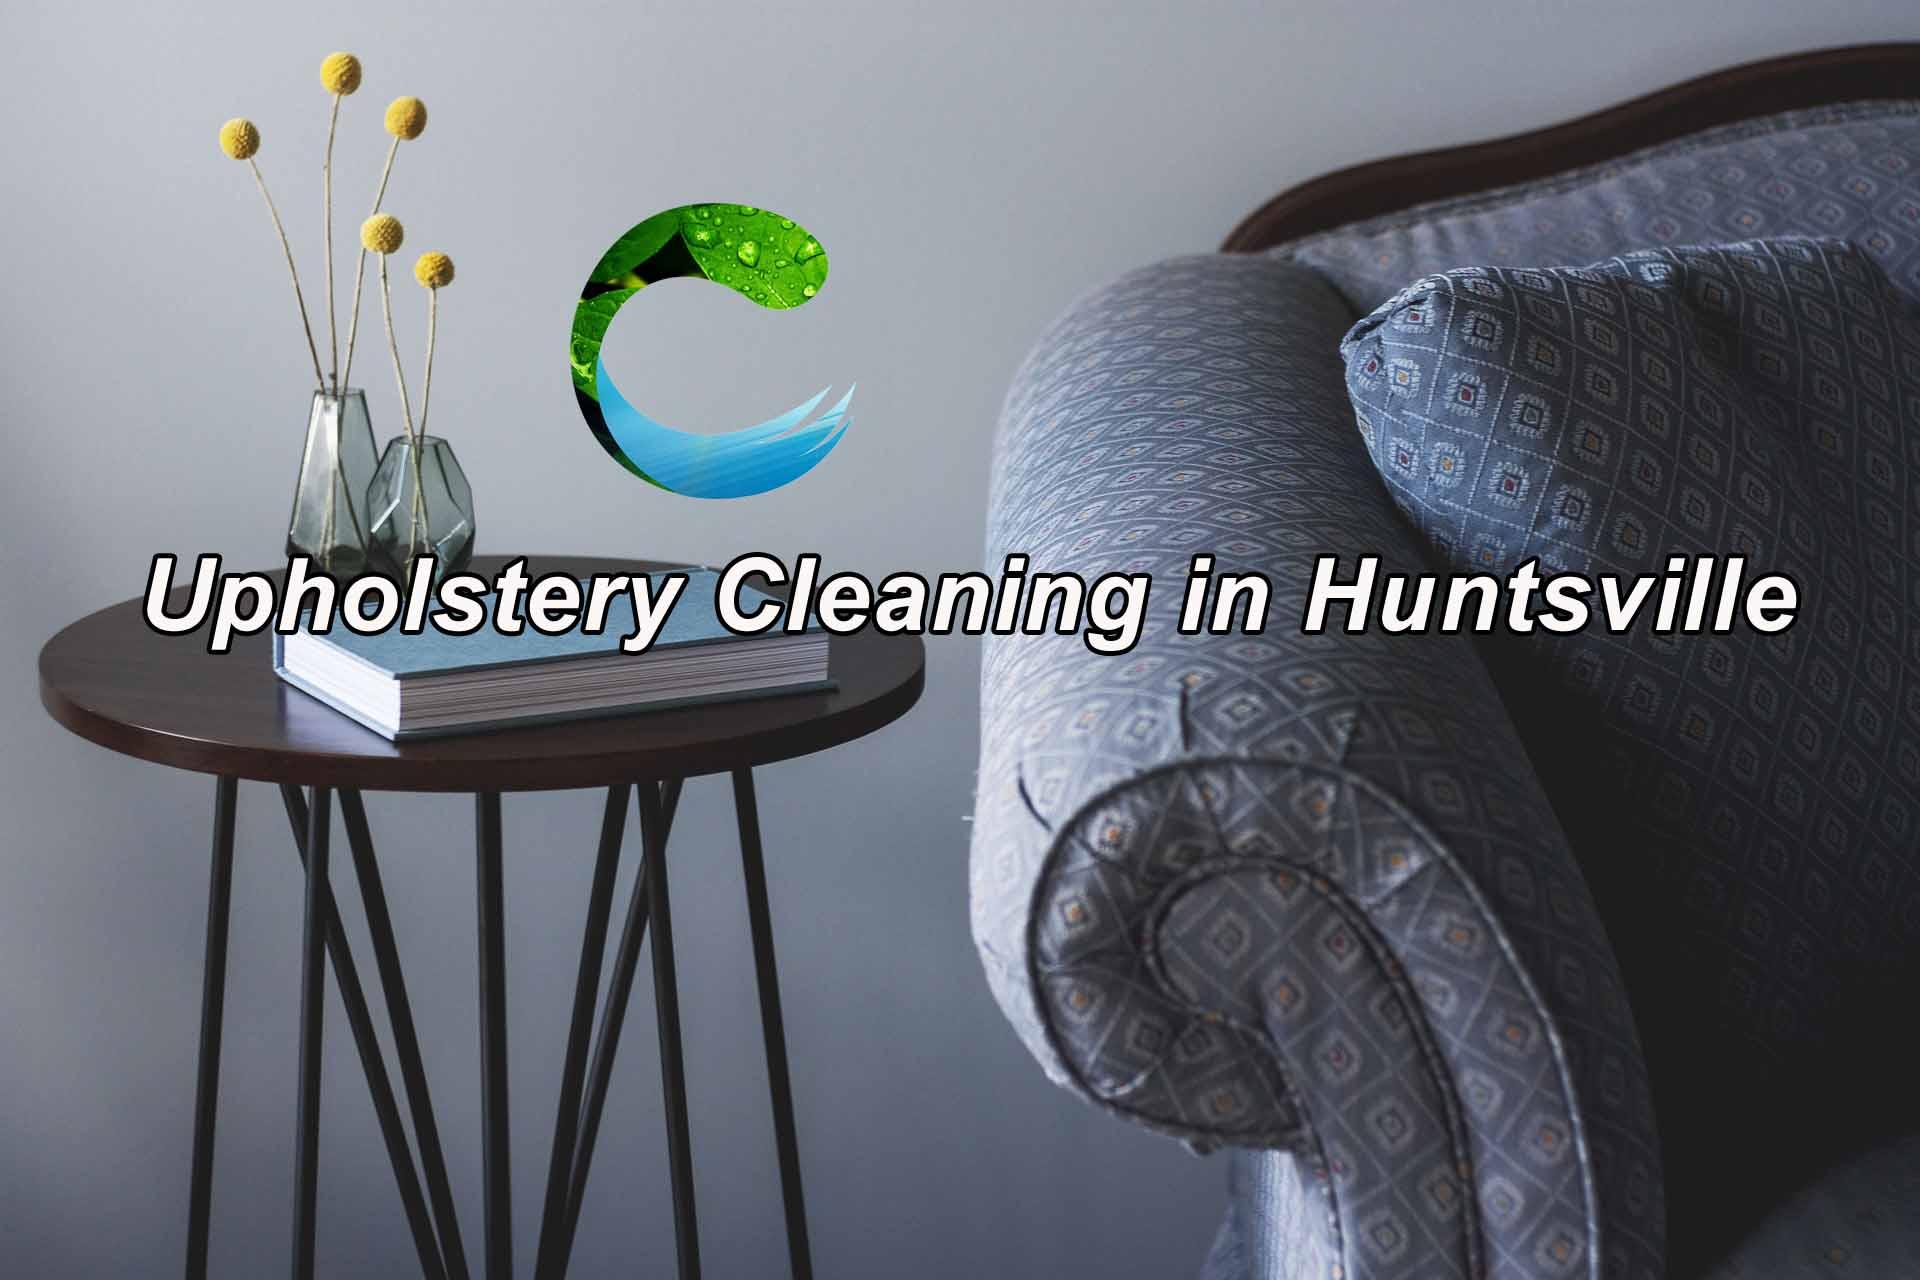 Upholstery Cleaning in Huntsville AL